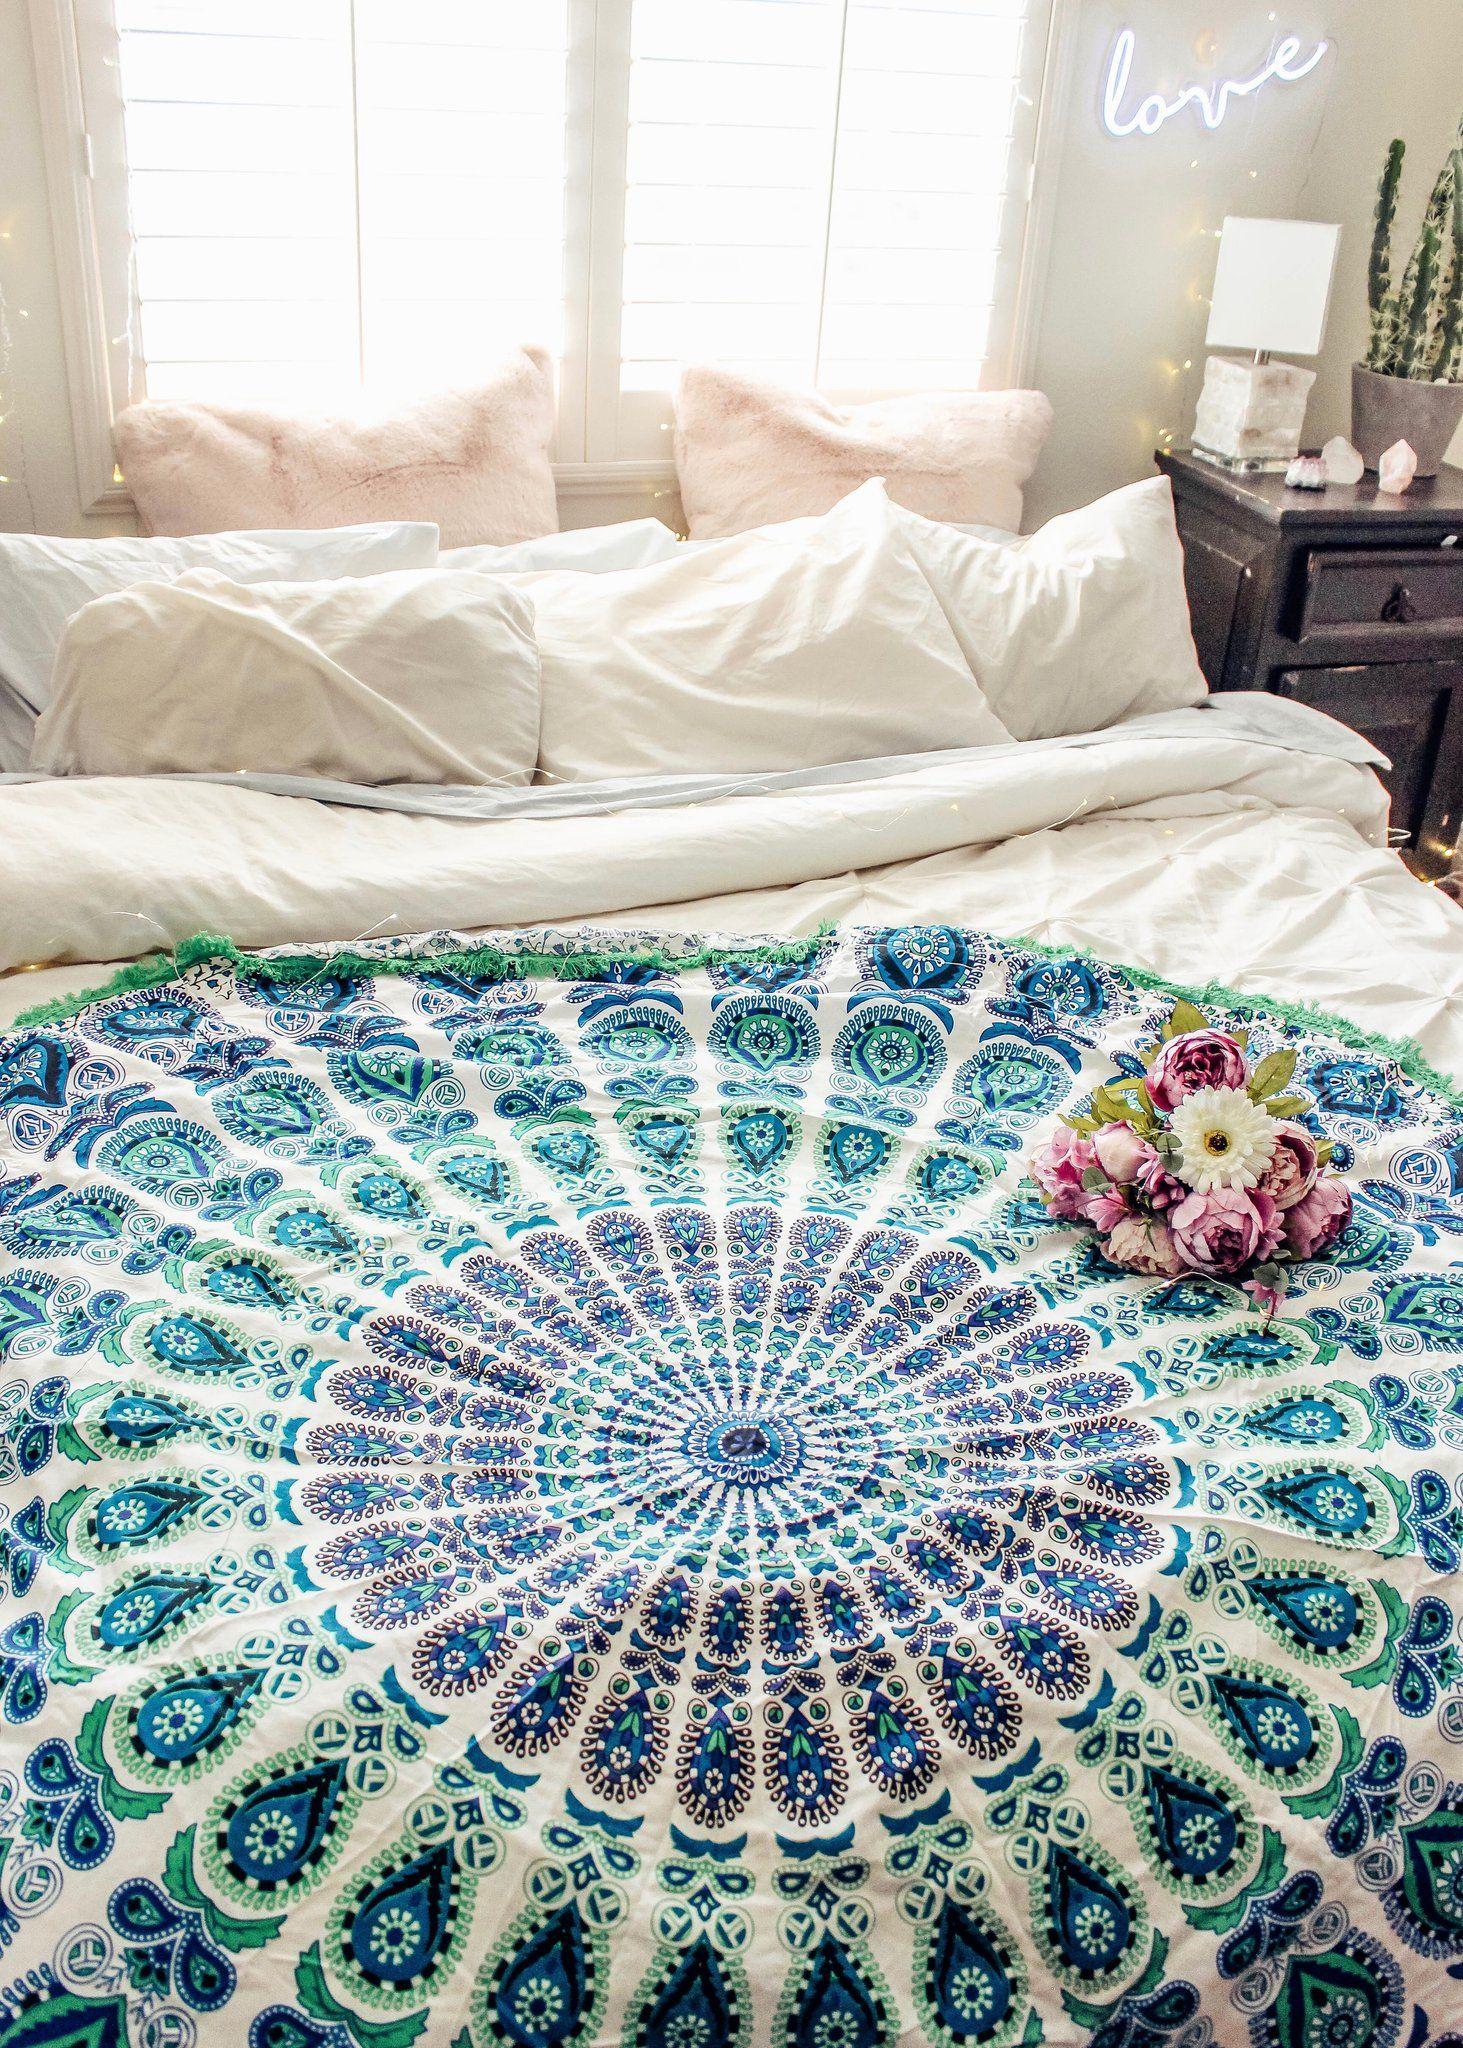 Aquamarine Mandala Tapestry Ladyscorpio101 Living room